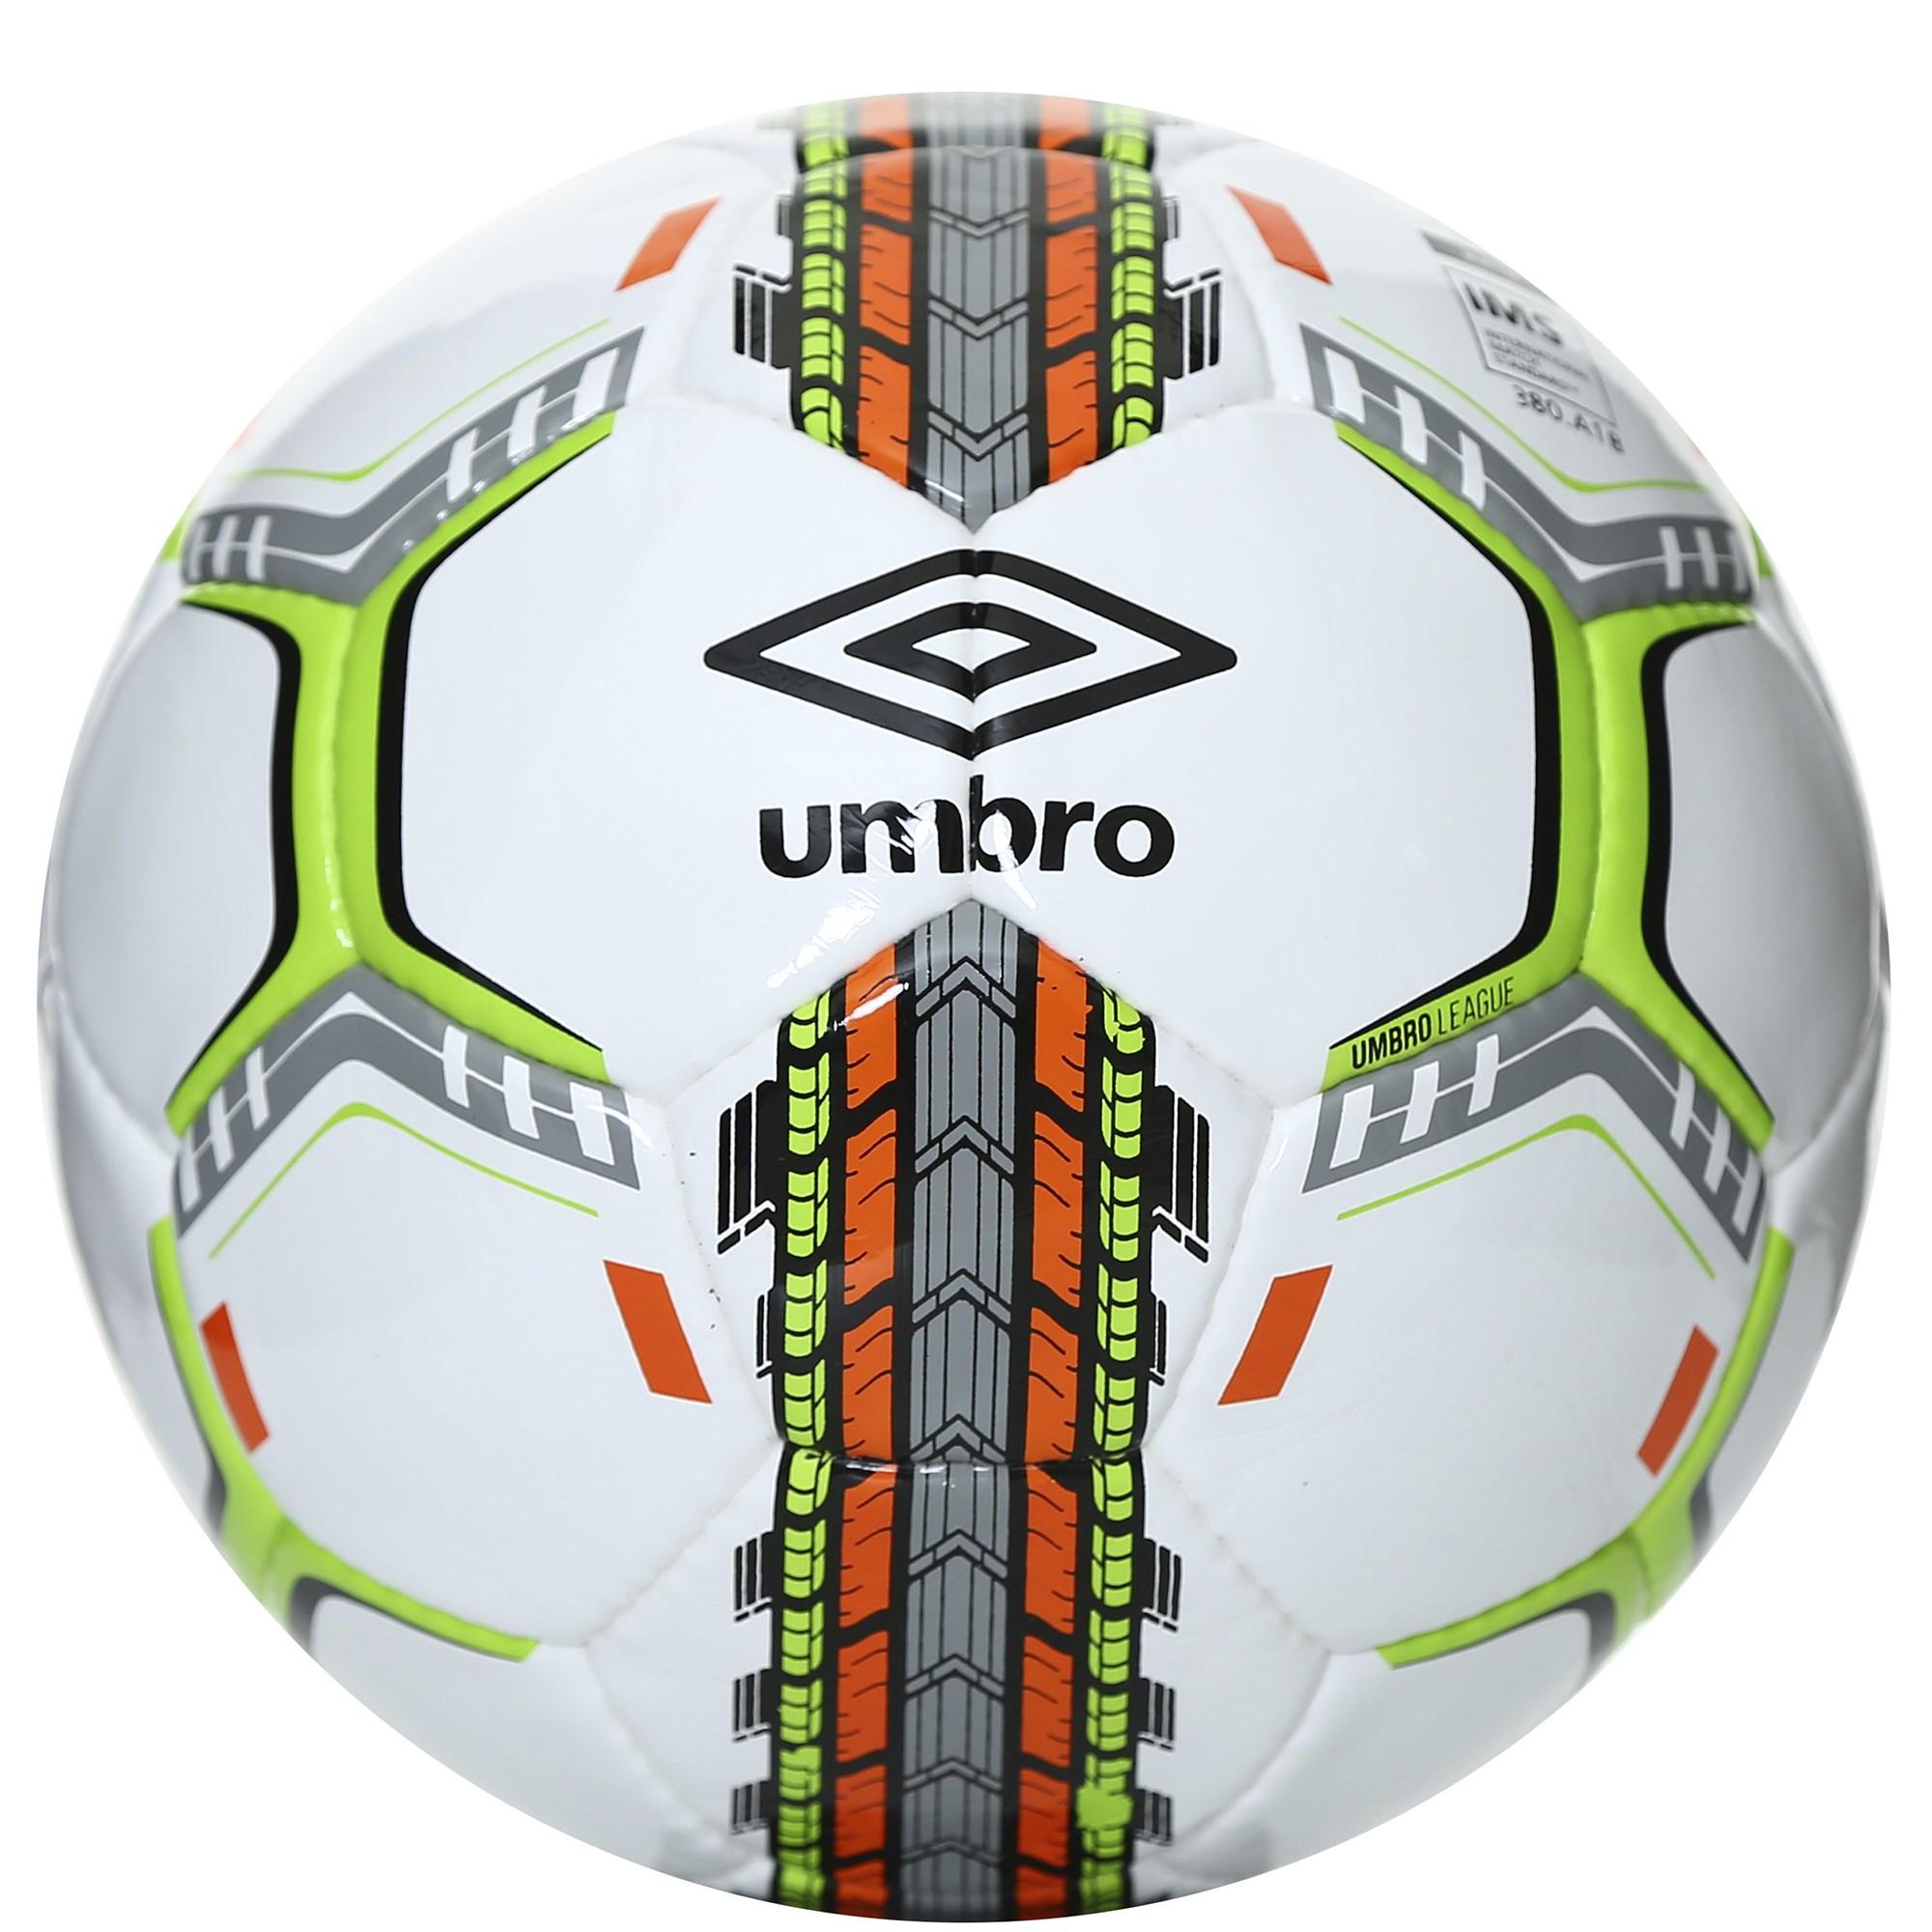 UMBRO 26553U TMATCH BALL Football Match Soccer Ball SIZE 5 ORIGINAL Euro 2020 Fifa UMBRO Sport Shoes Running  Joggers